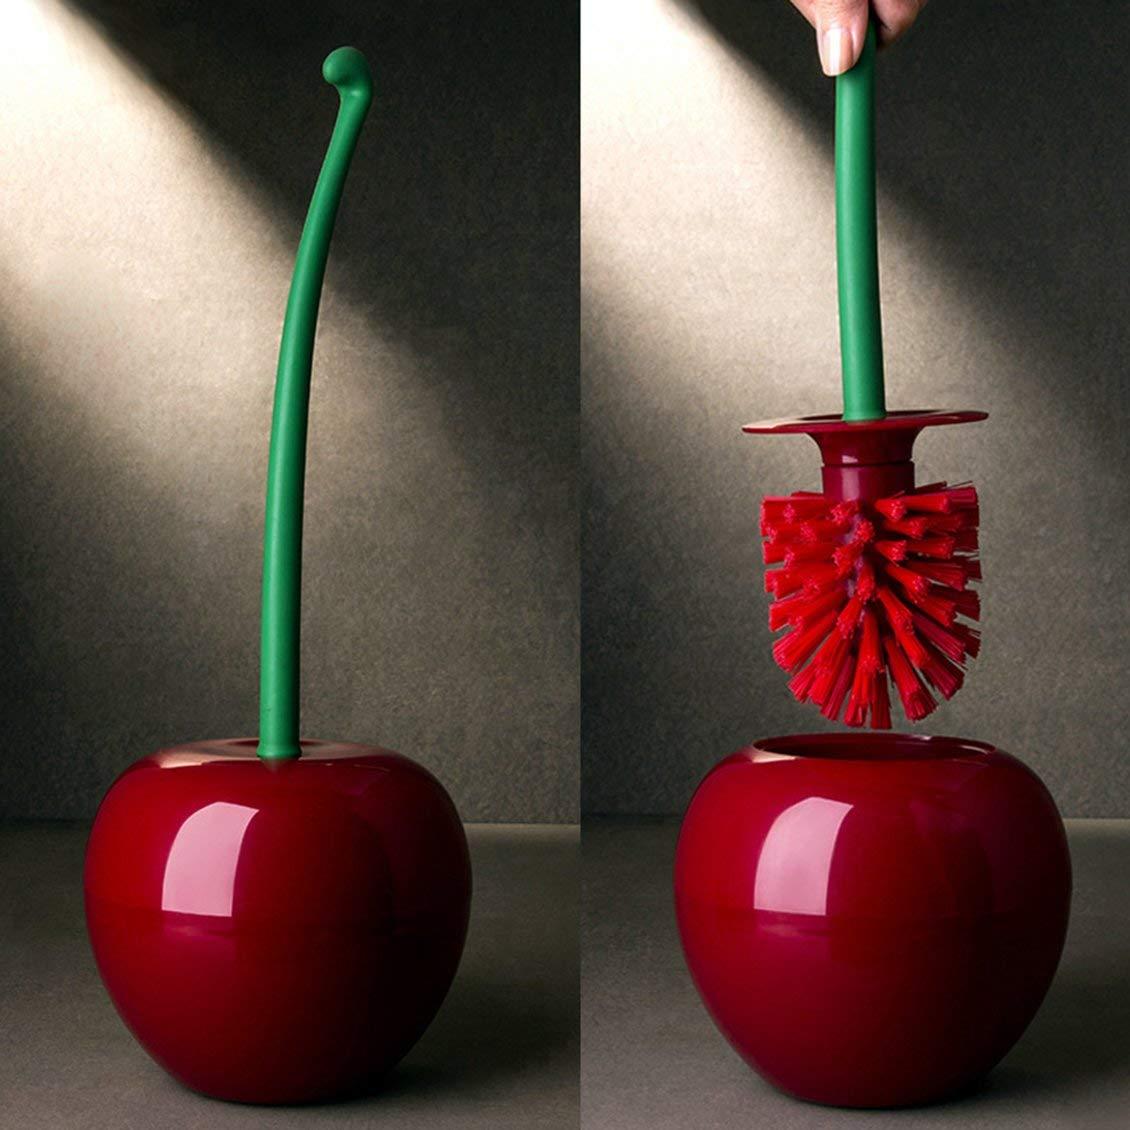 ForceSthrength Creative Lovely Cherry Shape Lavatory Brush Toilet Brush /& Holder Set